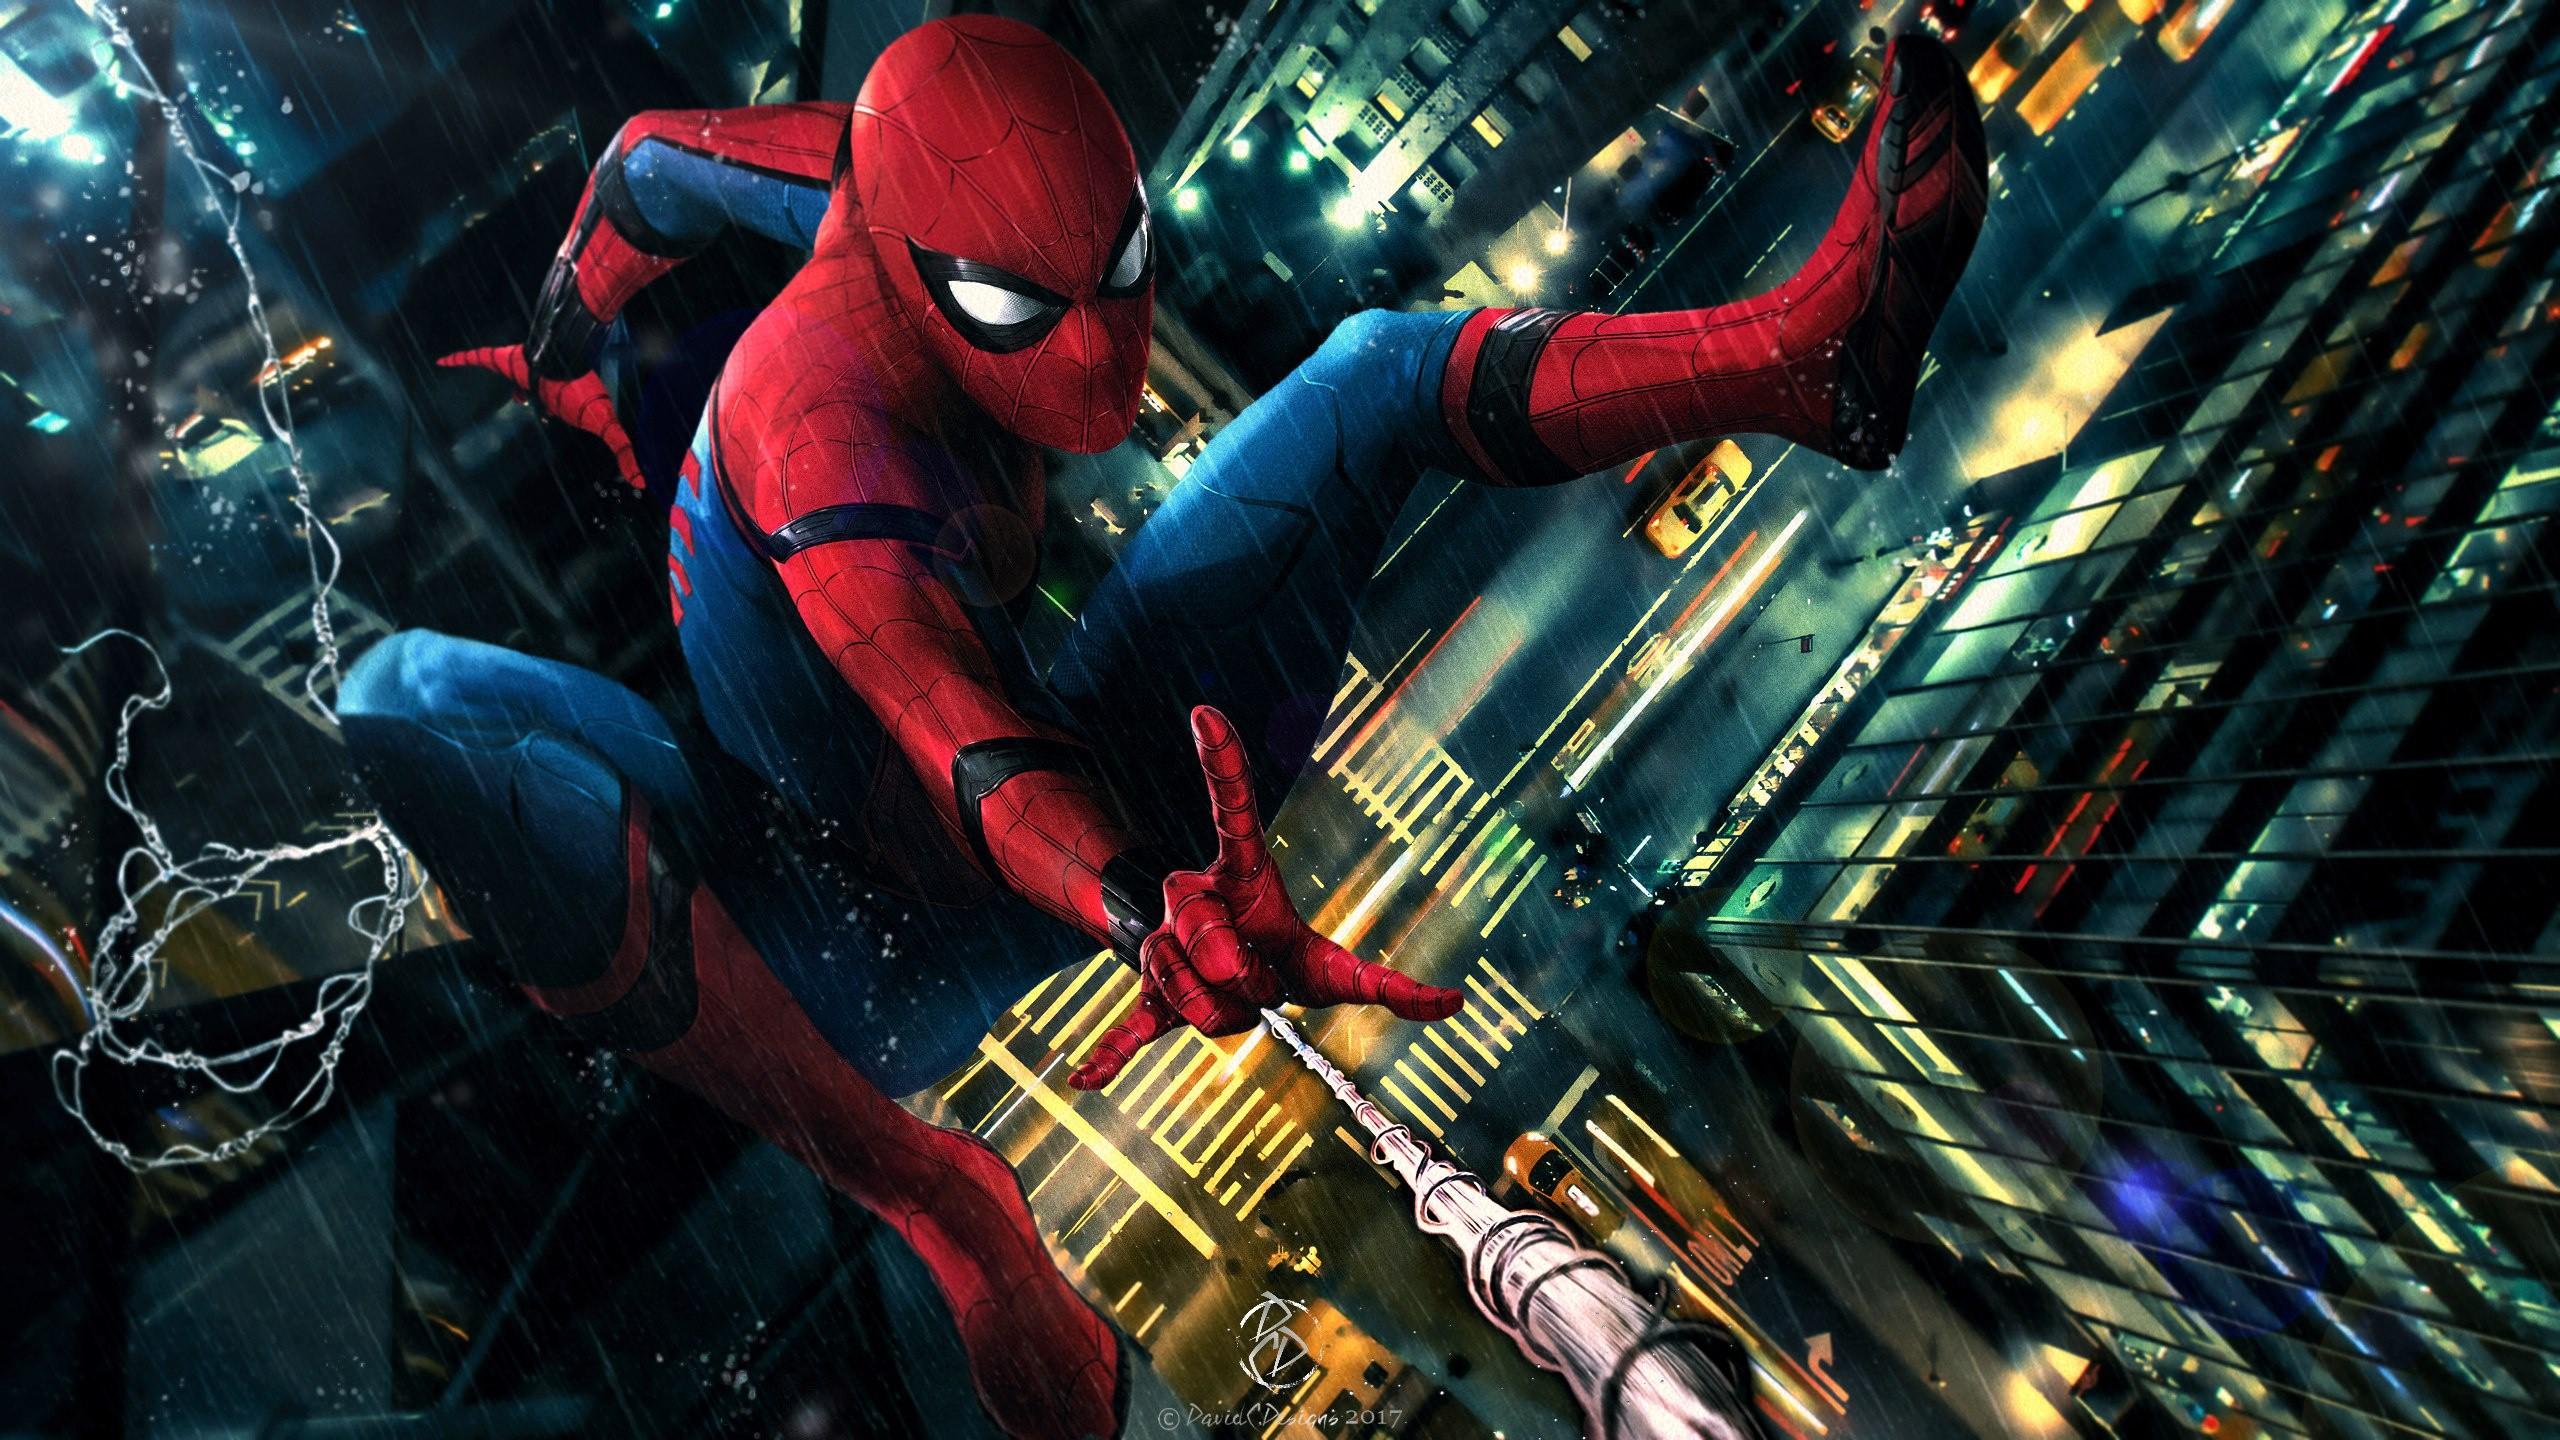 3d Cat Wallpapers Download Spider Man Homecoming Fan Art Wallpapers Hd Wallpapers